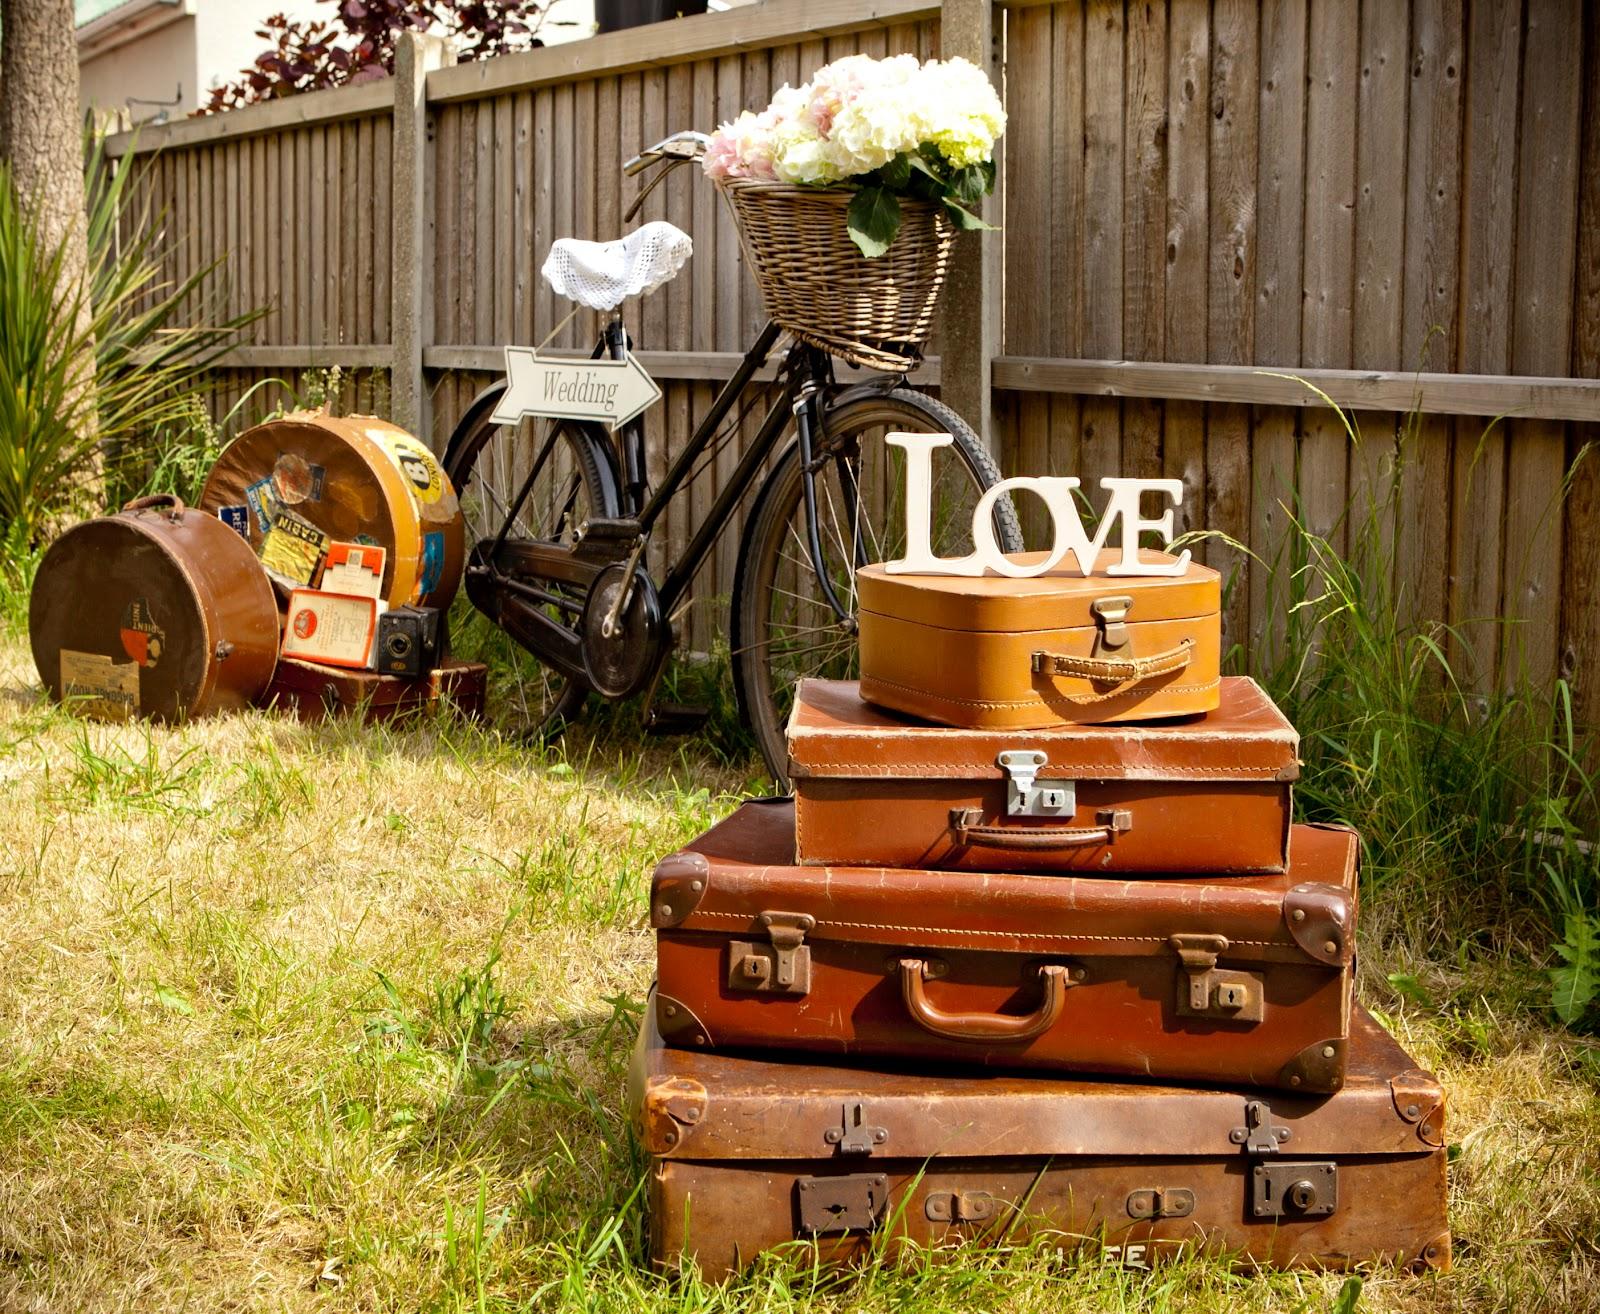 Wedding Photography Props: Bristol Vintage Wedding Fair: A SUNNY PROPS PHOTO SHOOT